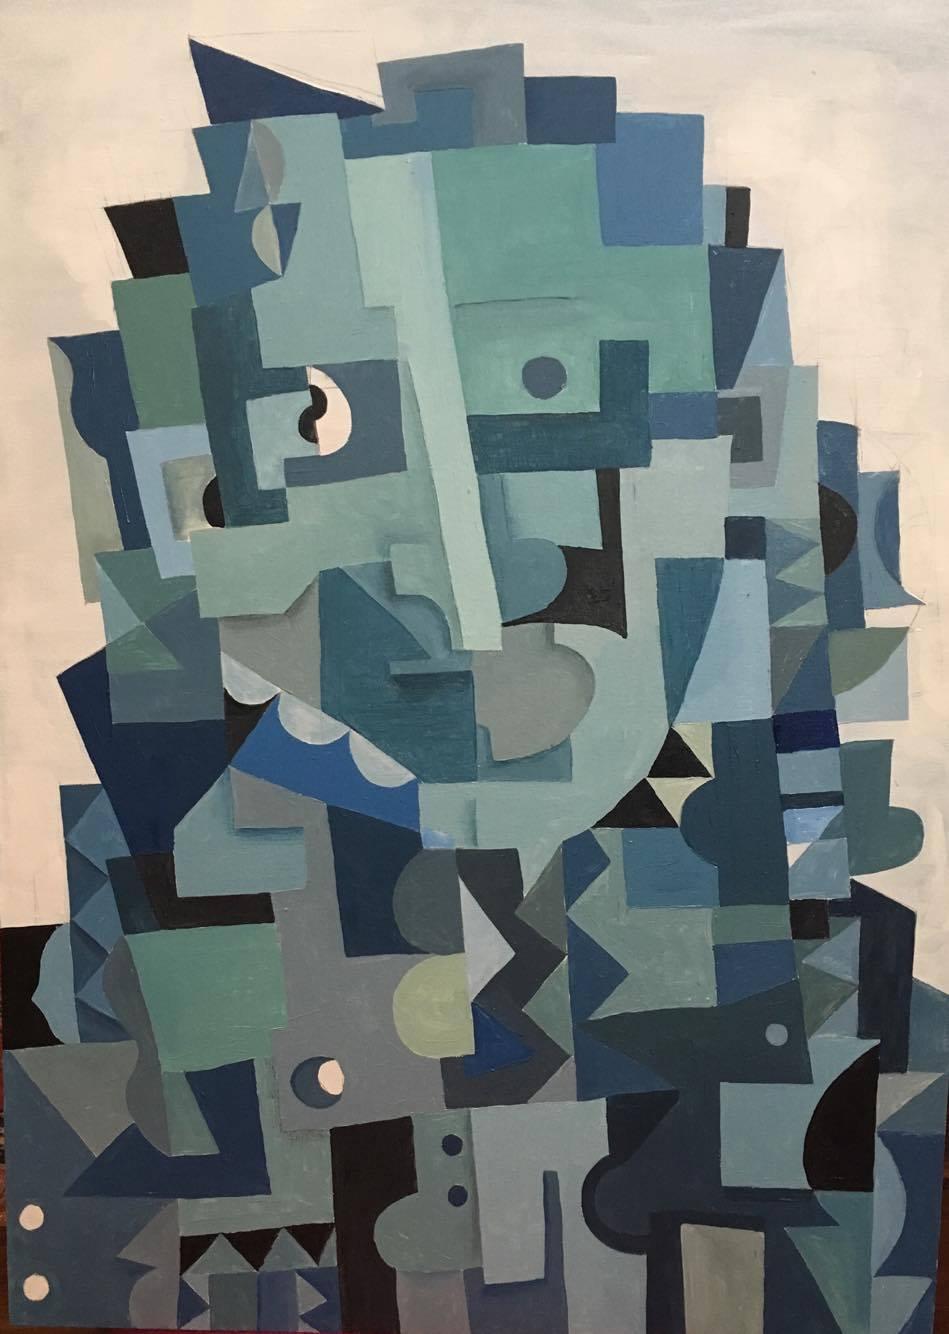 Blue Cube Man